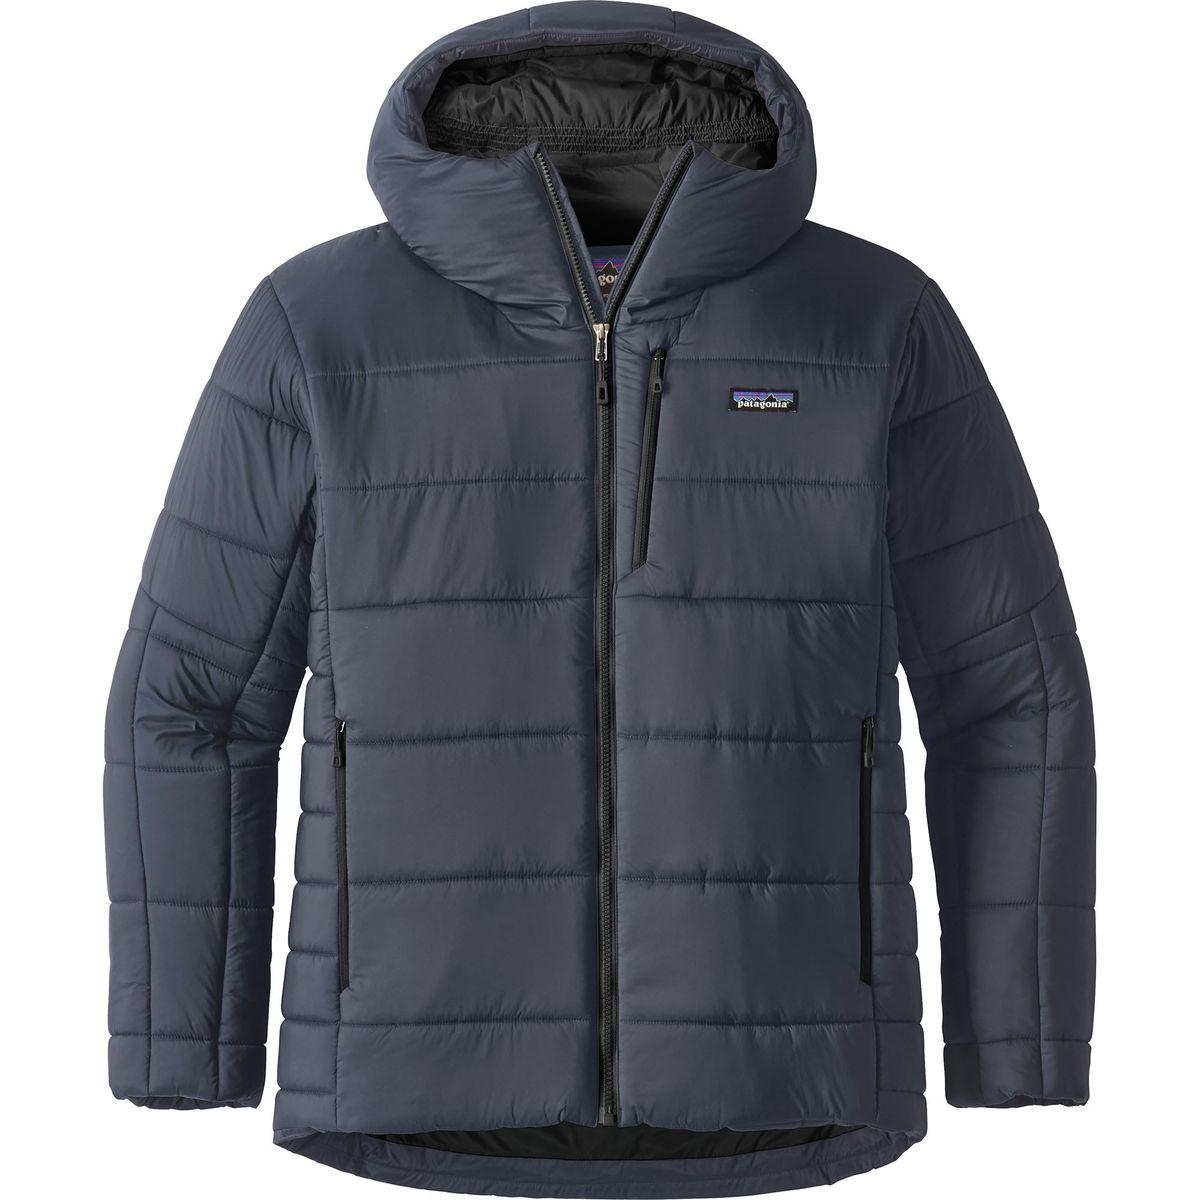 Patagonia Hyper Puff Hooded Jacket - Men